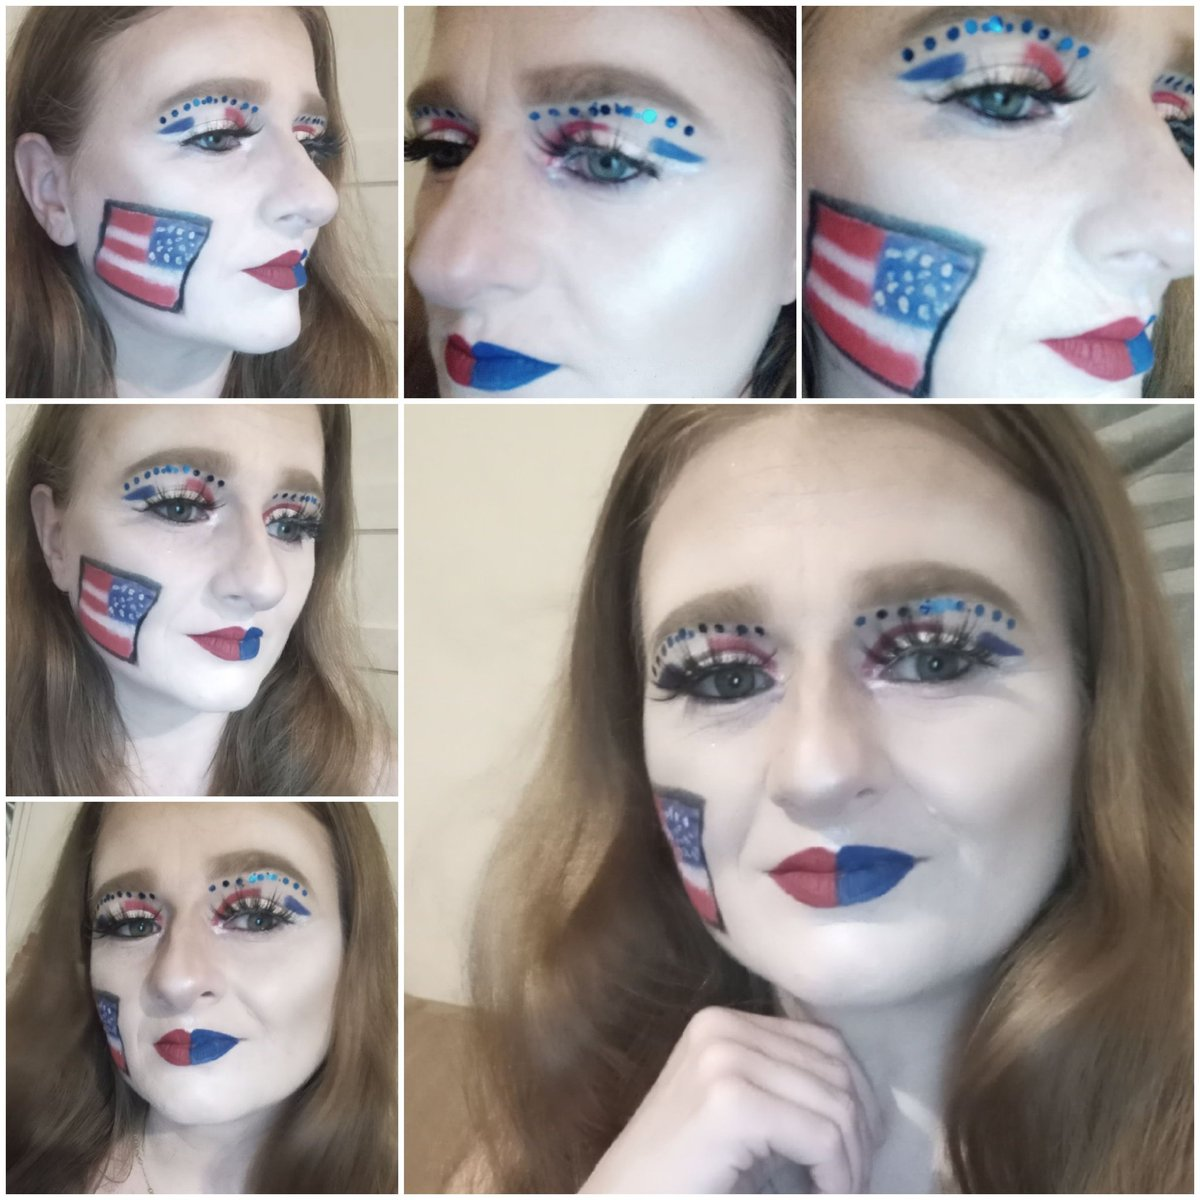 #mua #glitter #glittermakeup #morphe #morphebrushes #morphebabe #maquillajeprofesional #maquillaje #ojos #liveglam #neon #tartecosmetics #tarte #touchinsol #makeupartist #makeup #lashes #lashesonfleek #lashesonpoint #eyeliner #eyelineronpoint #eyebrows #eyebrowsonfleek  #neon https://twitter.com/Lluvianna1213/status/1279638403064217600…pic.twitter.com/hEAKnamVNb